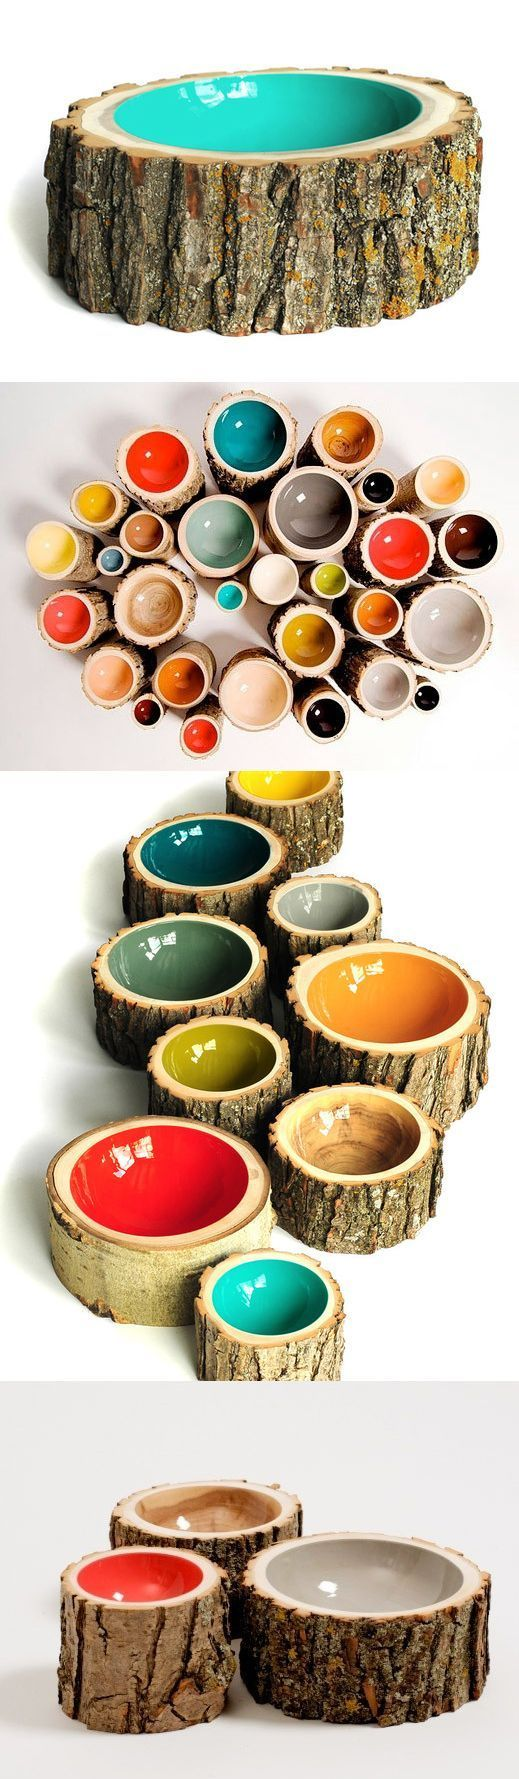 tree log bowls!    #LOVE!!!!!!!                                                                                                                                                                                 Más